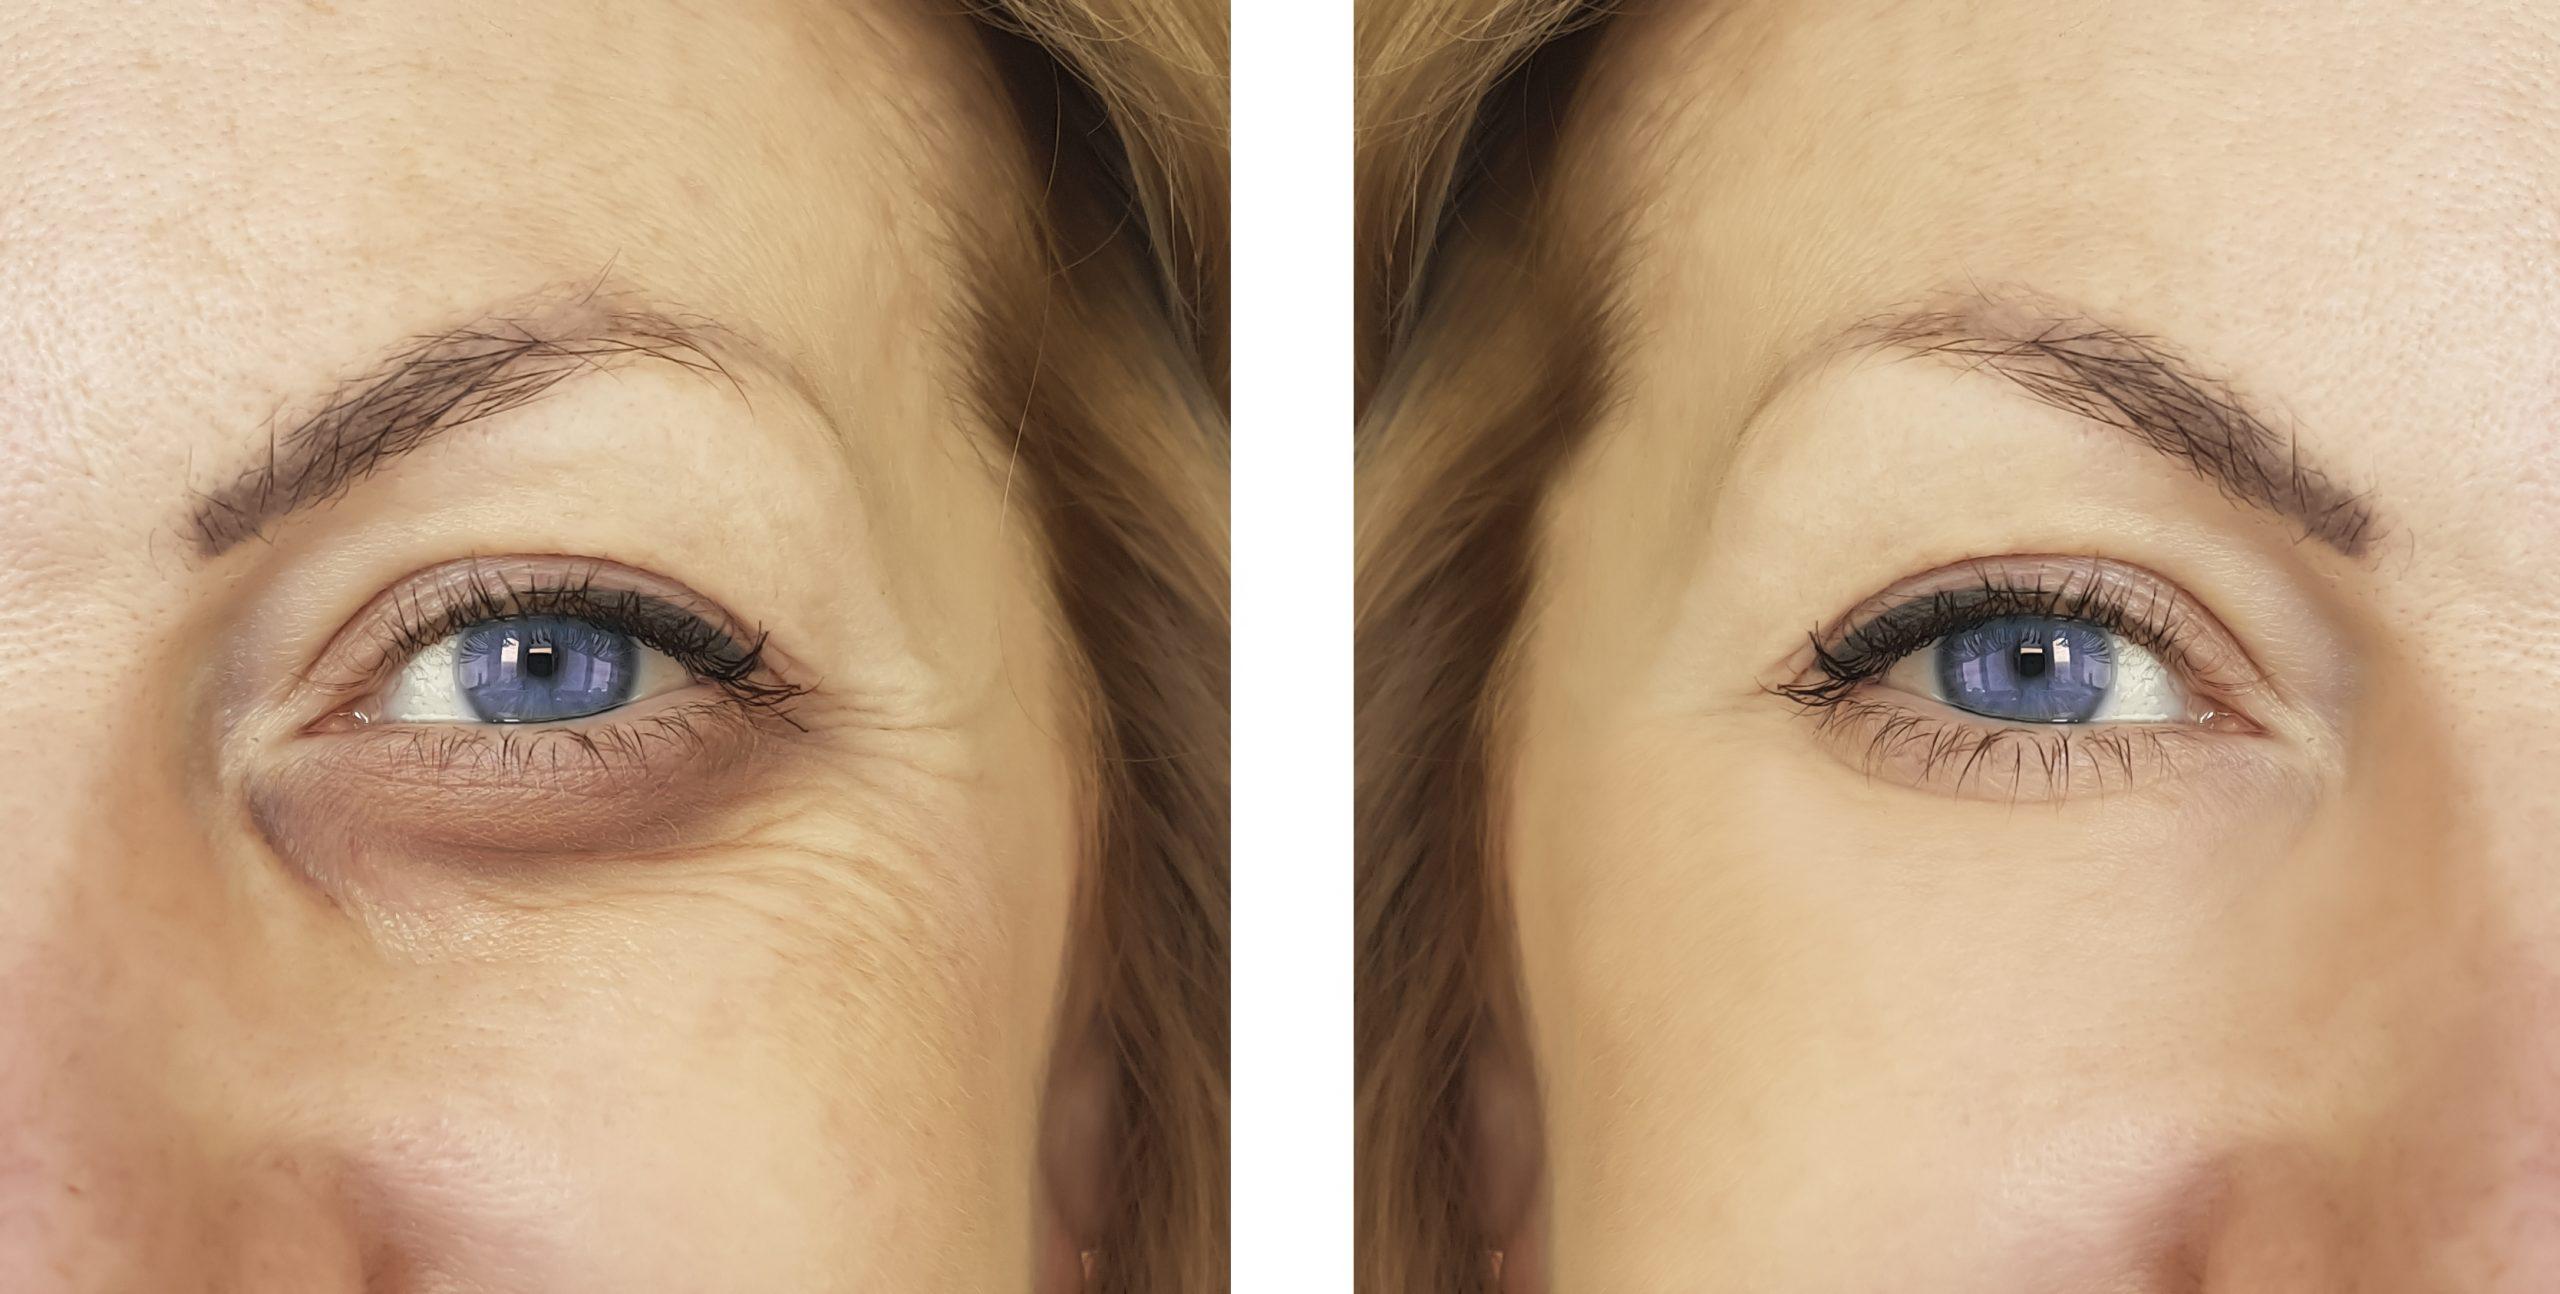 Options to treat my eye area